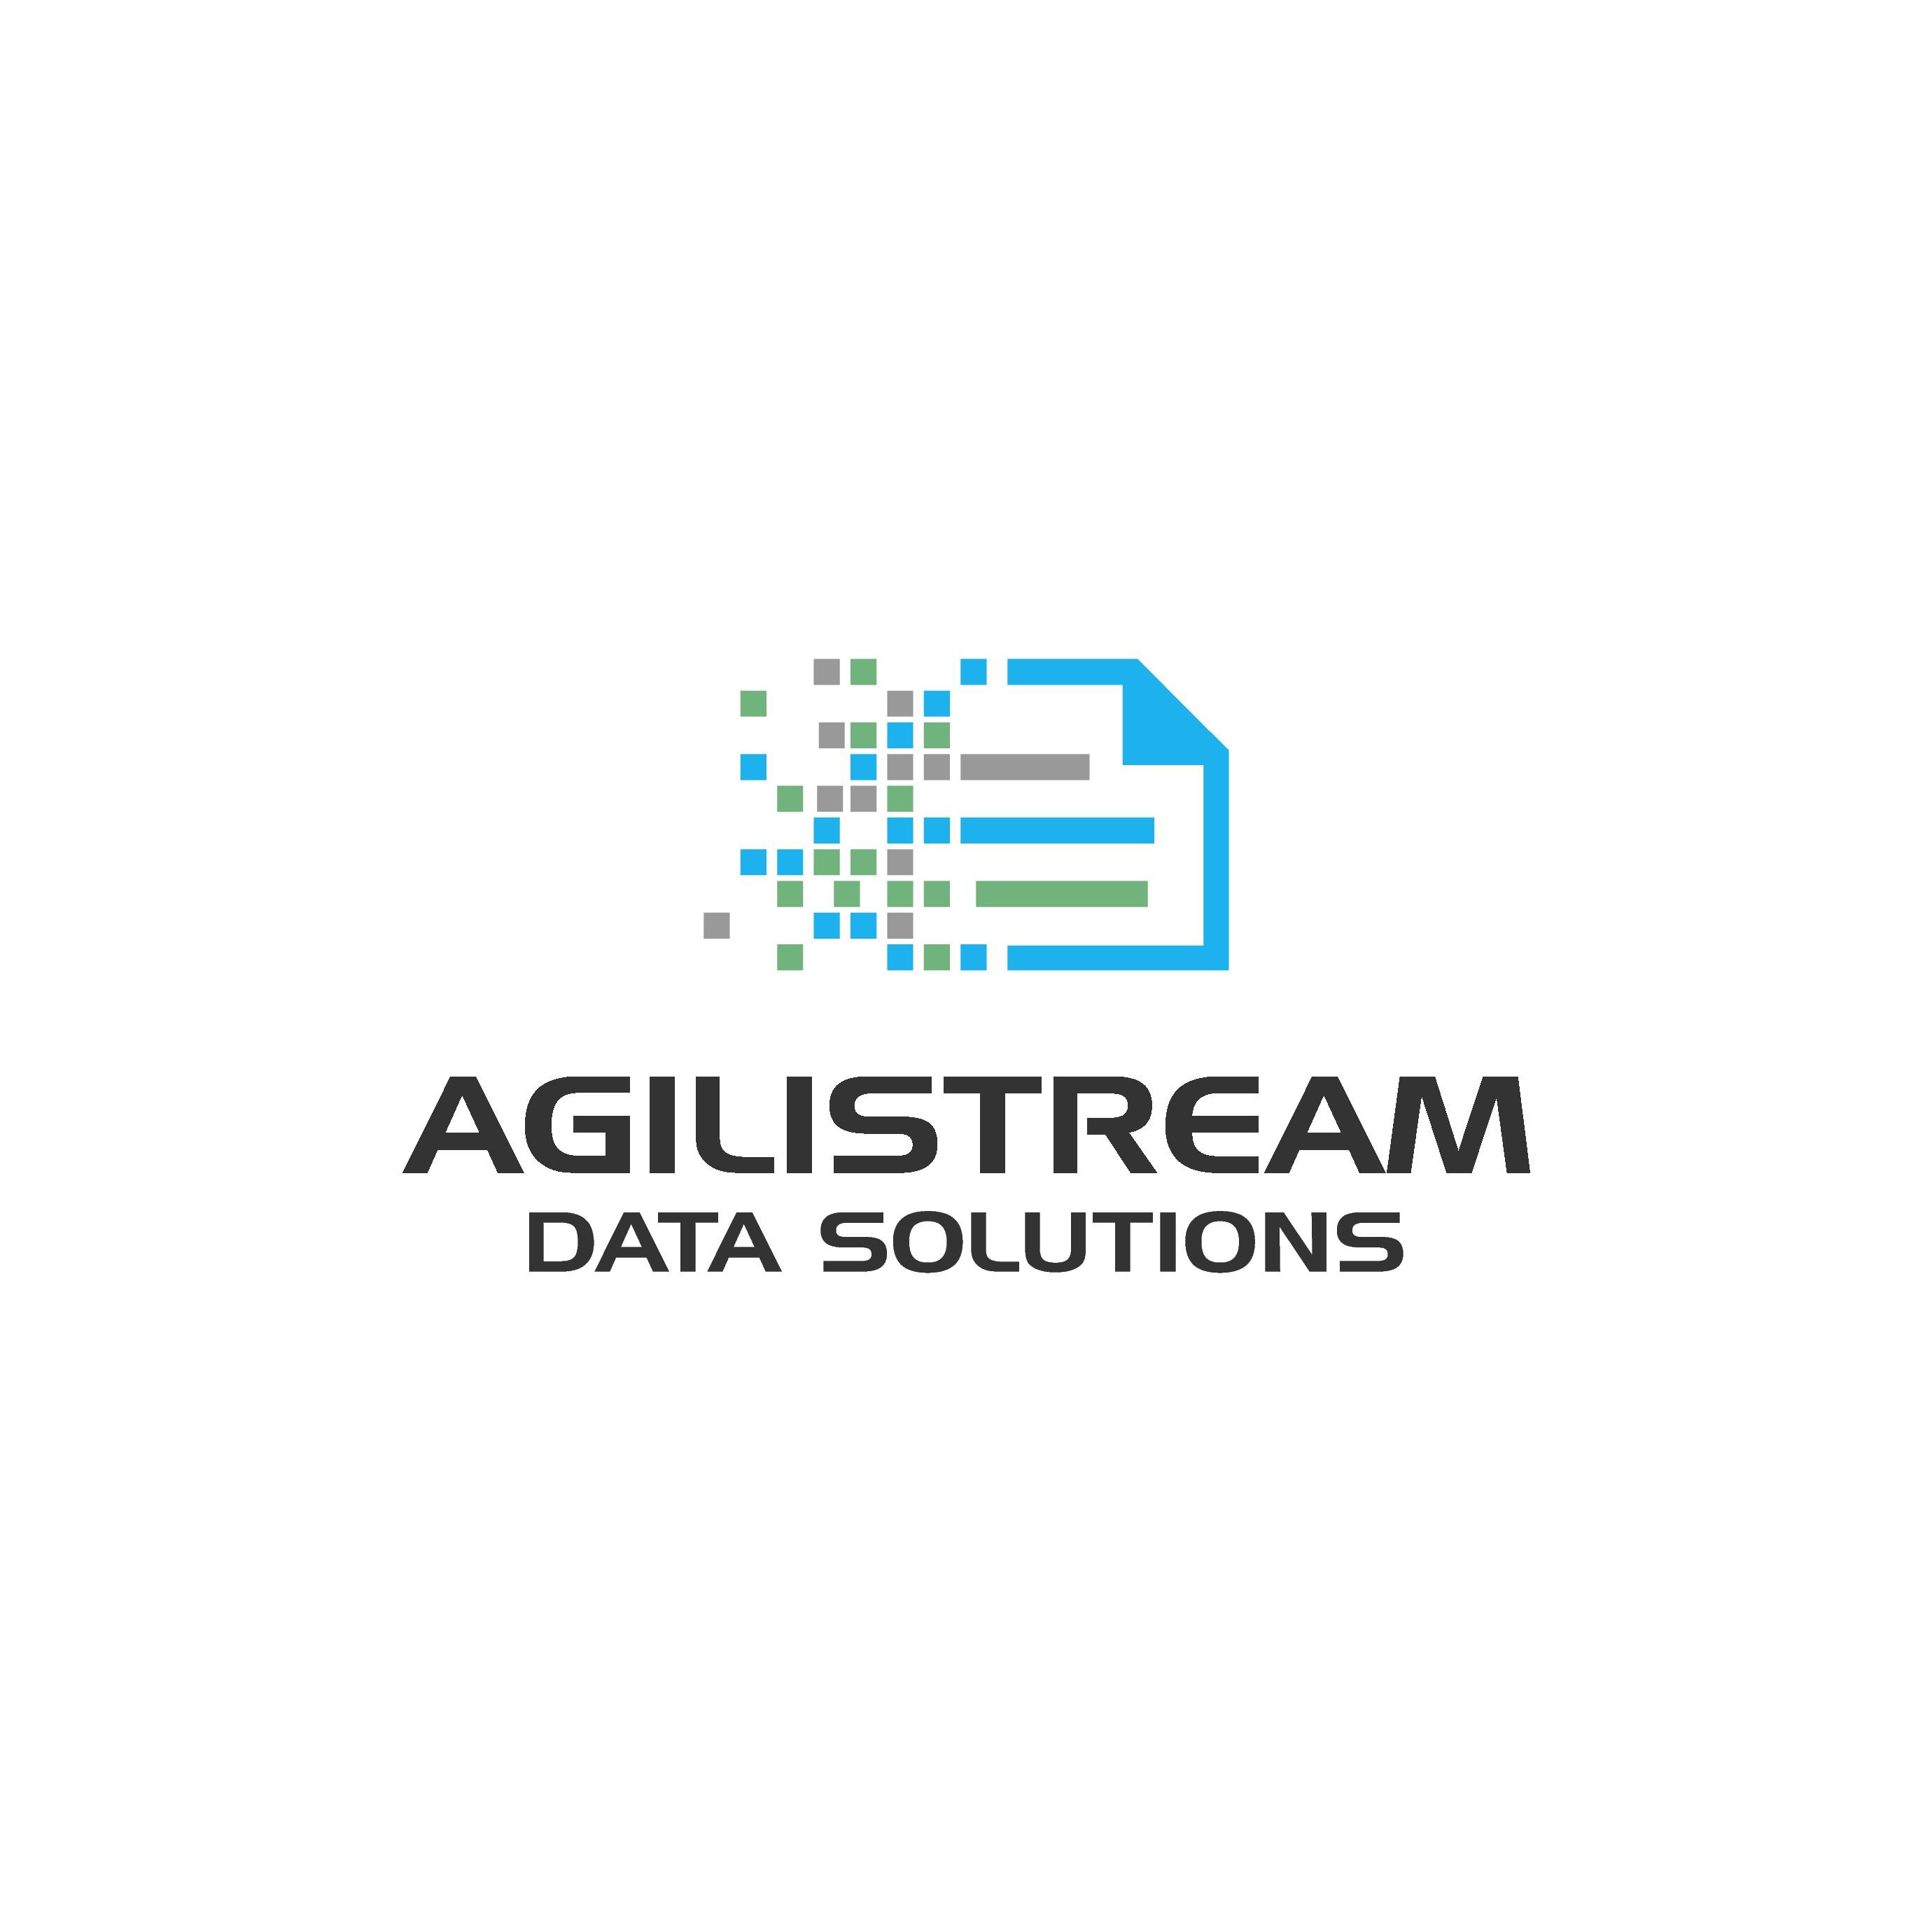 Design a logo and business card for Agilistream Data Solutions